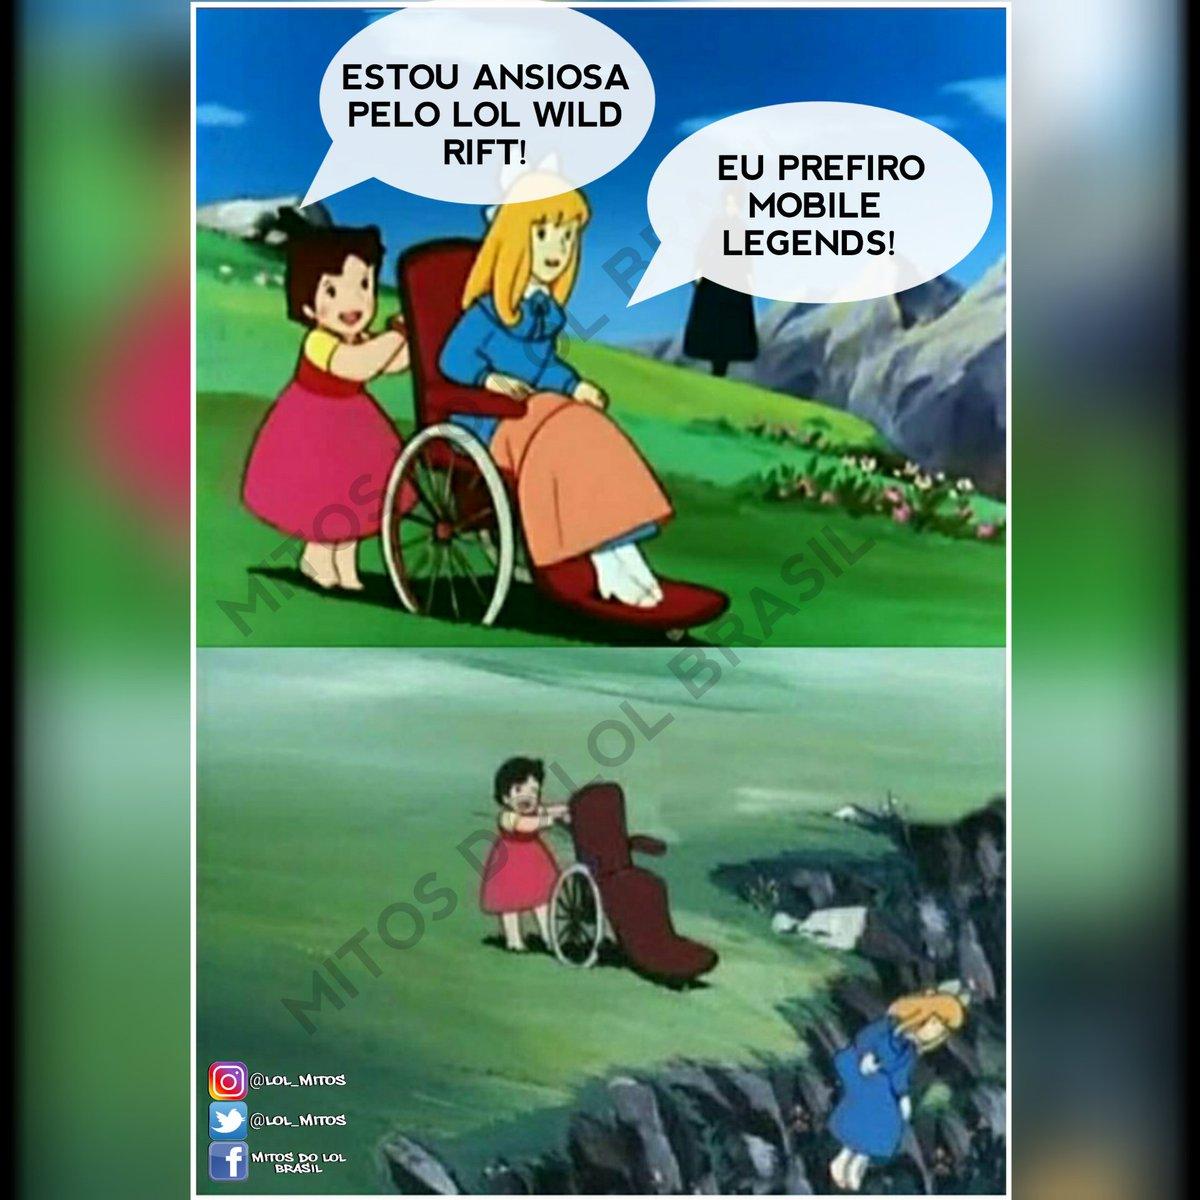 Sad....  #leagueoflegendsbrasil #leagueoflegends #wildriftlolbr #riotgames #lolbrasil #sdv #lolwildrift #lol #league #riotgames #riot #gamer #leagueoflegendscosplay #leagueoflegendsmemes #lolmemes #yasuo #legends #leagueoflegendsmeme #mitosdololbrpic.twitter.com/iXd8tJwnsW